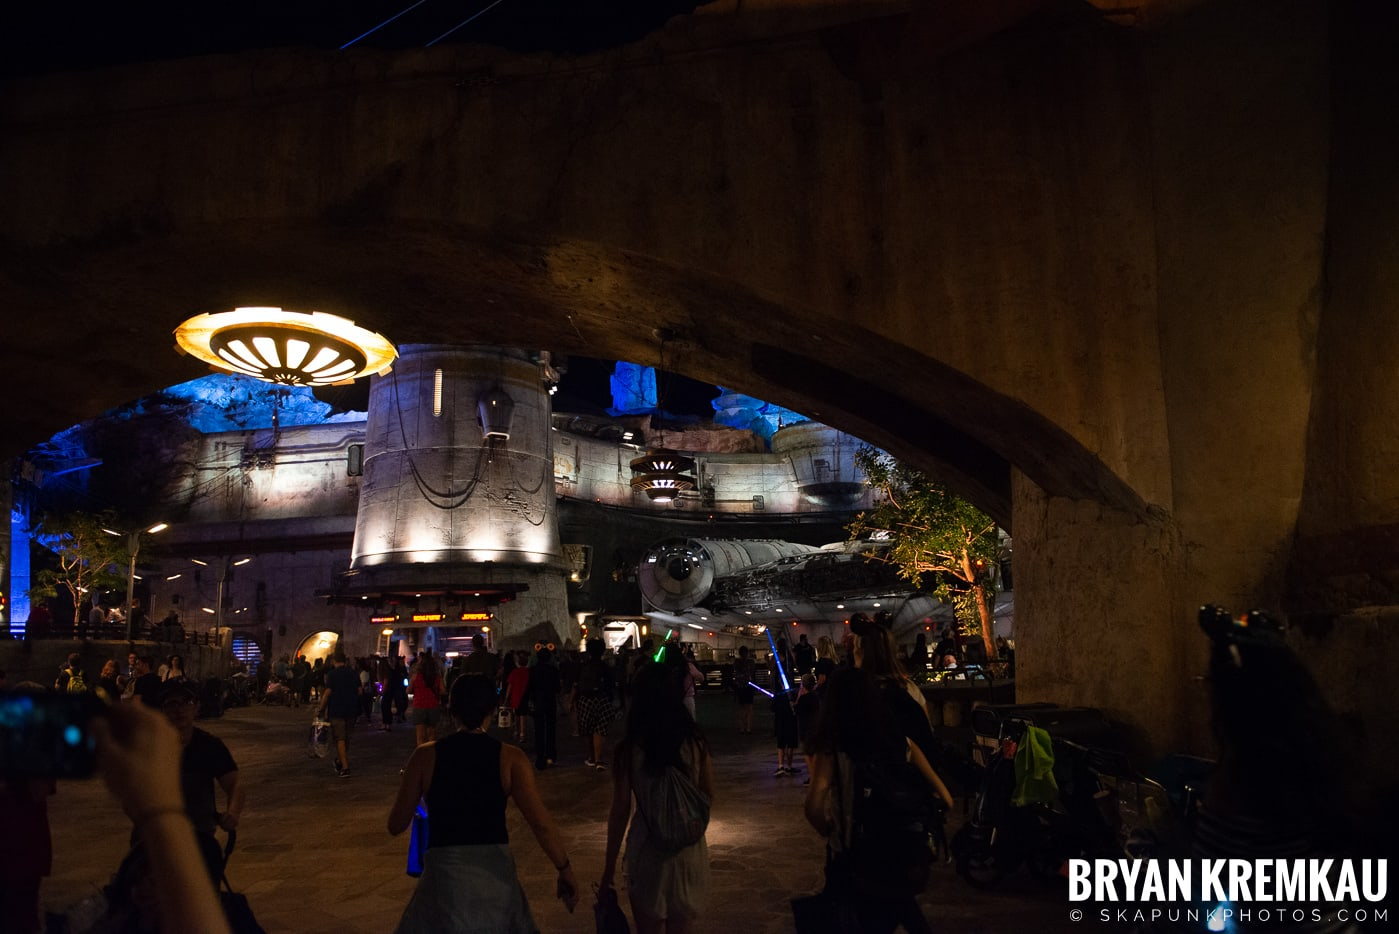 Walt Disney World Vacation: Day 5 (Animal Kingdom / Disney's Hollywood Studios) - 10.3.19 (11)